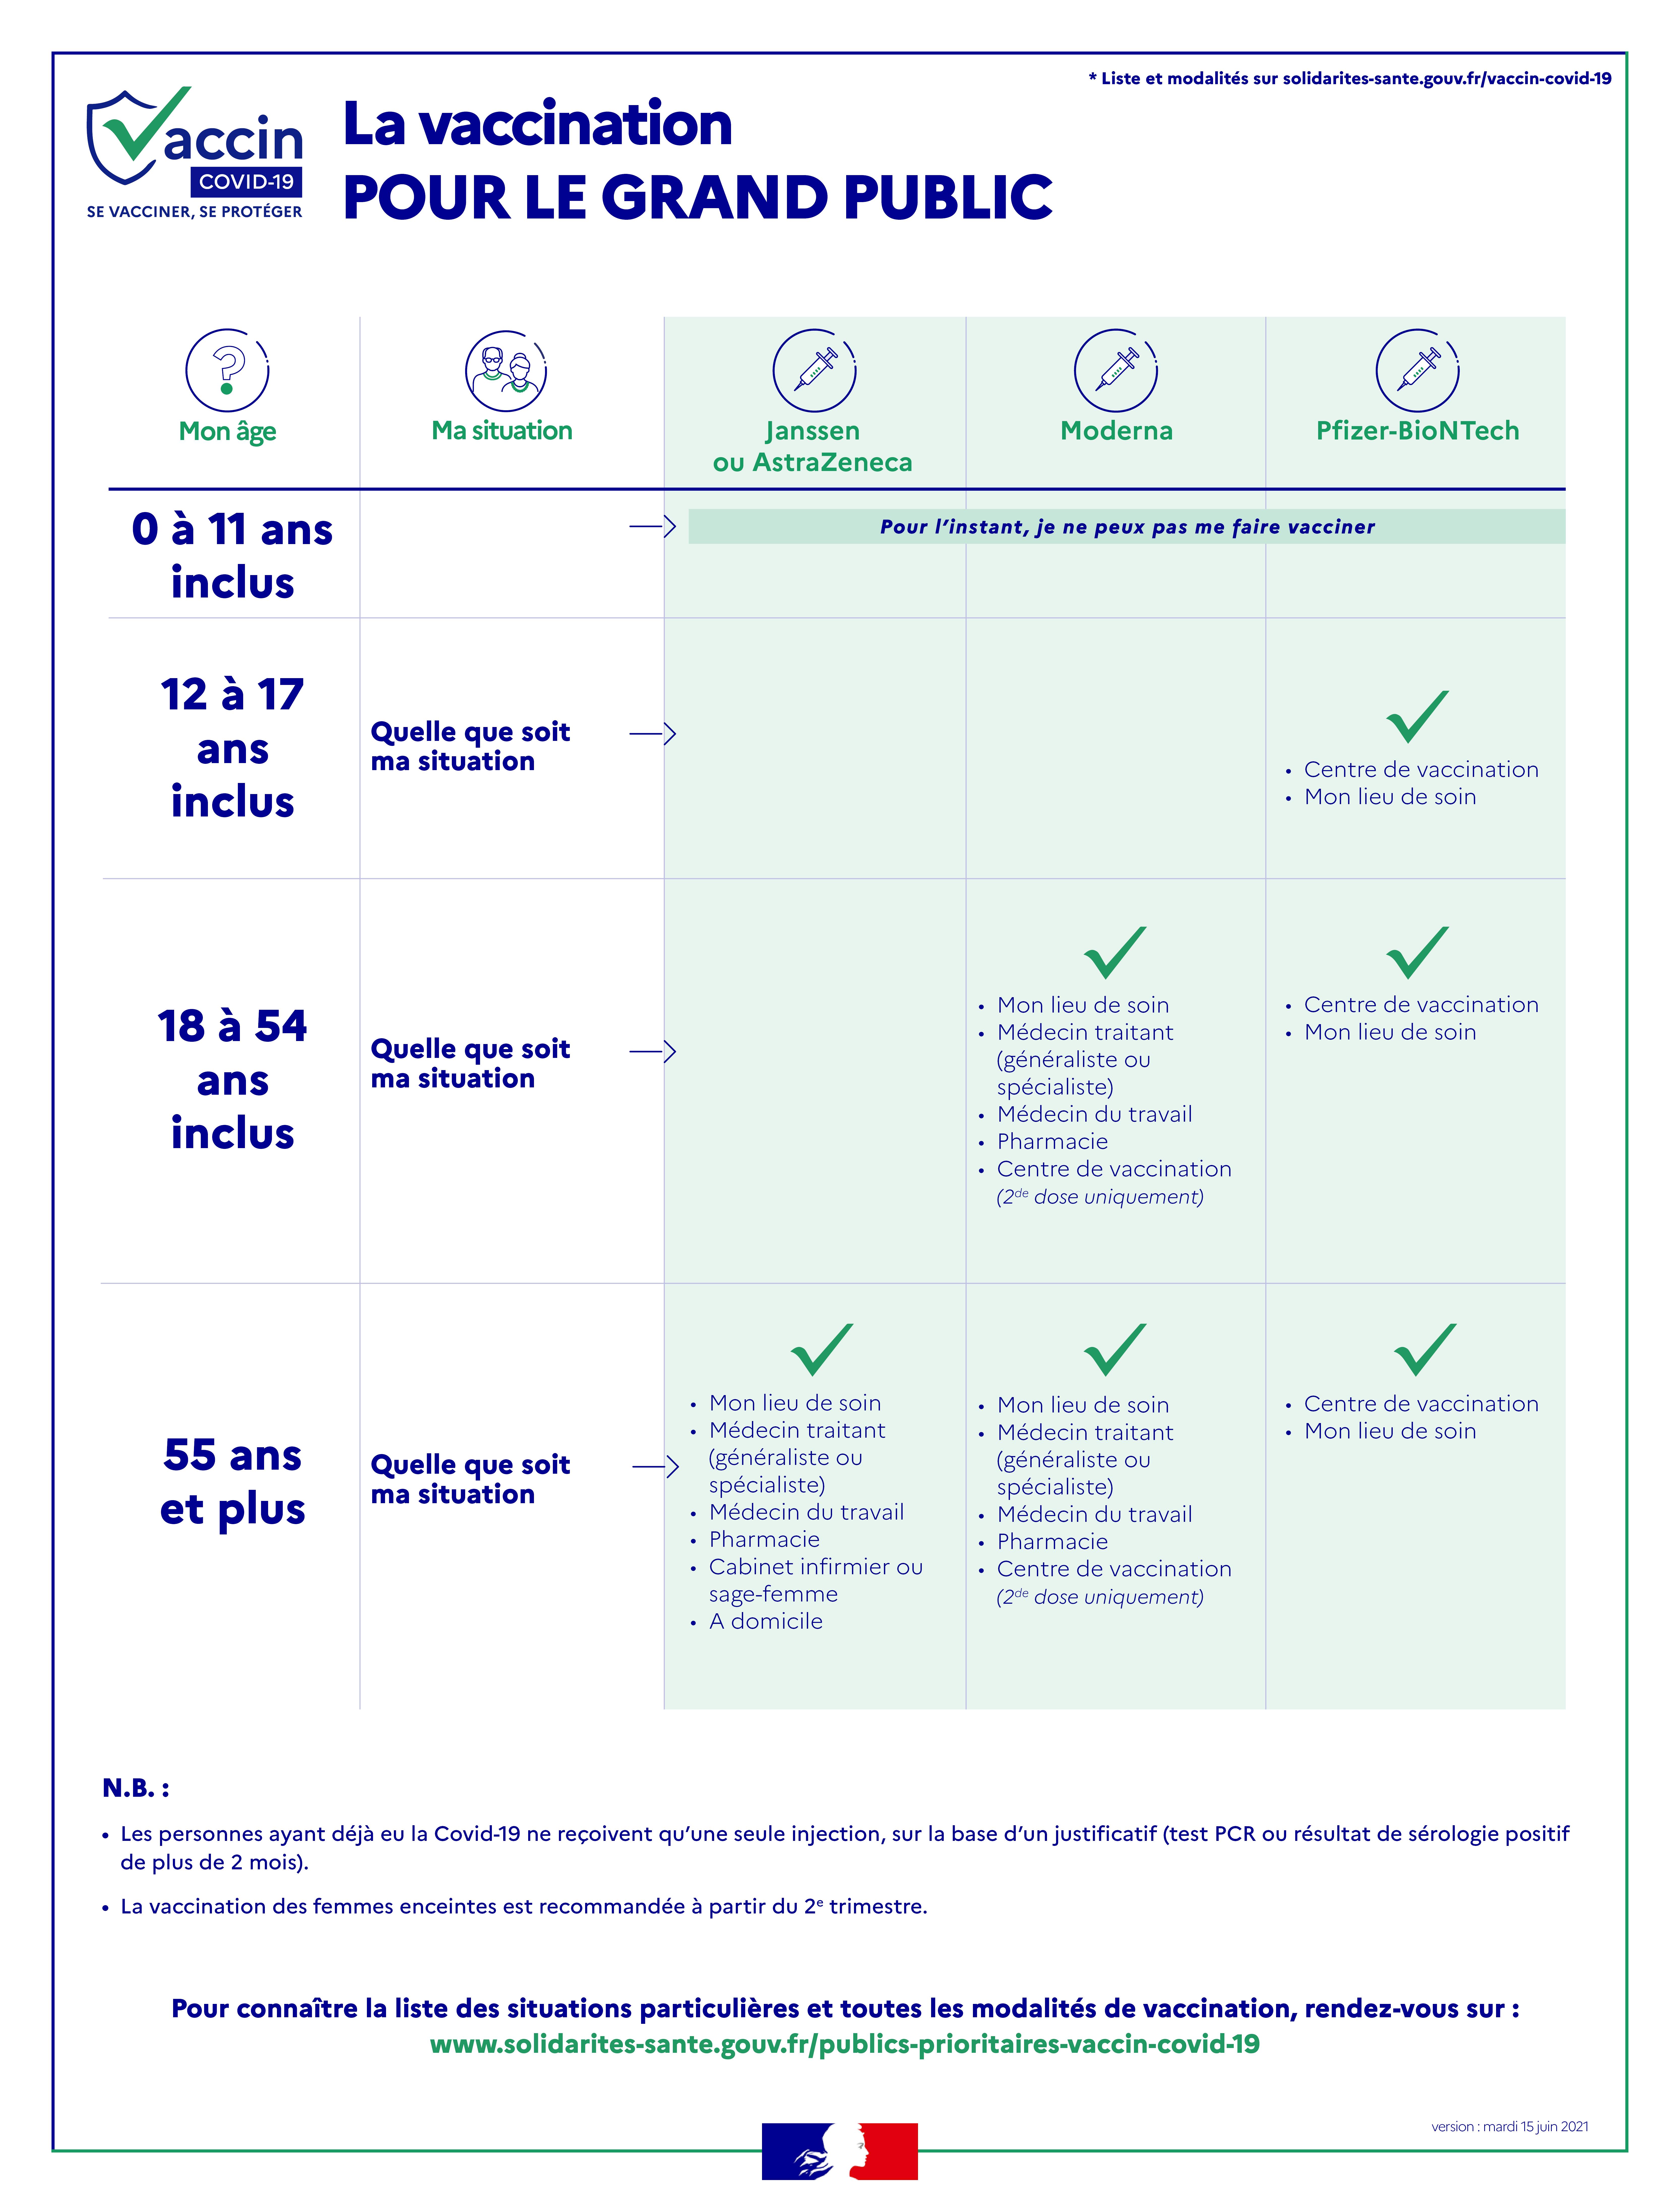 Infos Vaccination Covid-19 (au 15 juin)